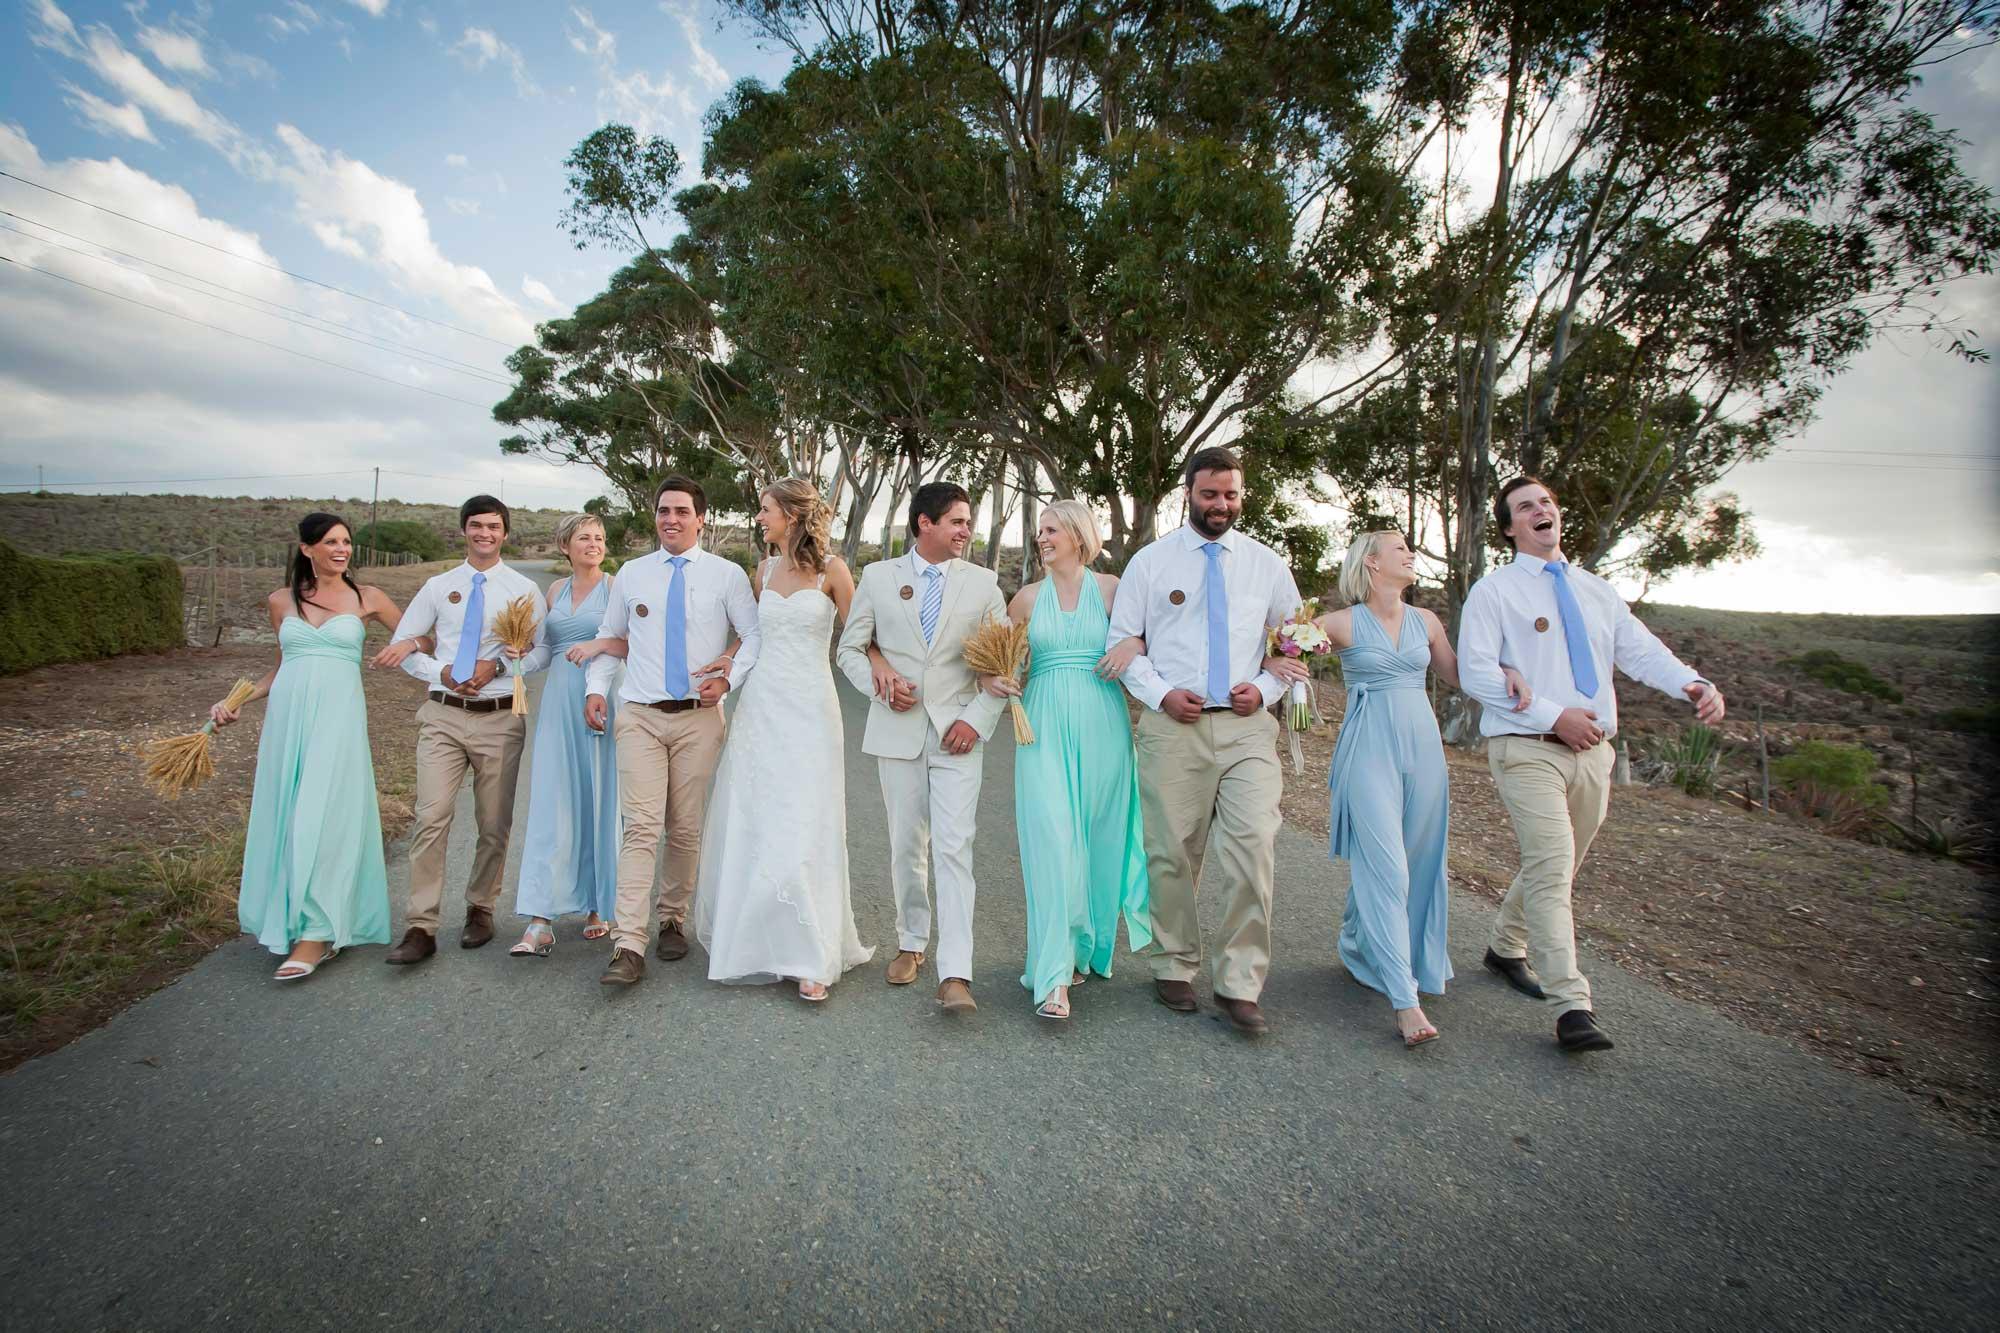 malgas wedding photography bridal party walking in road